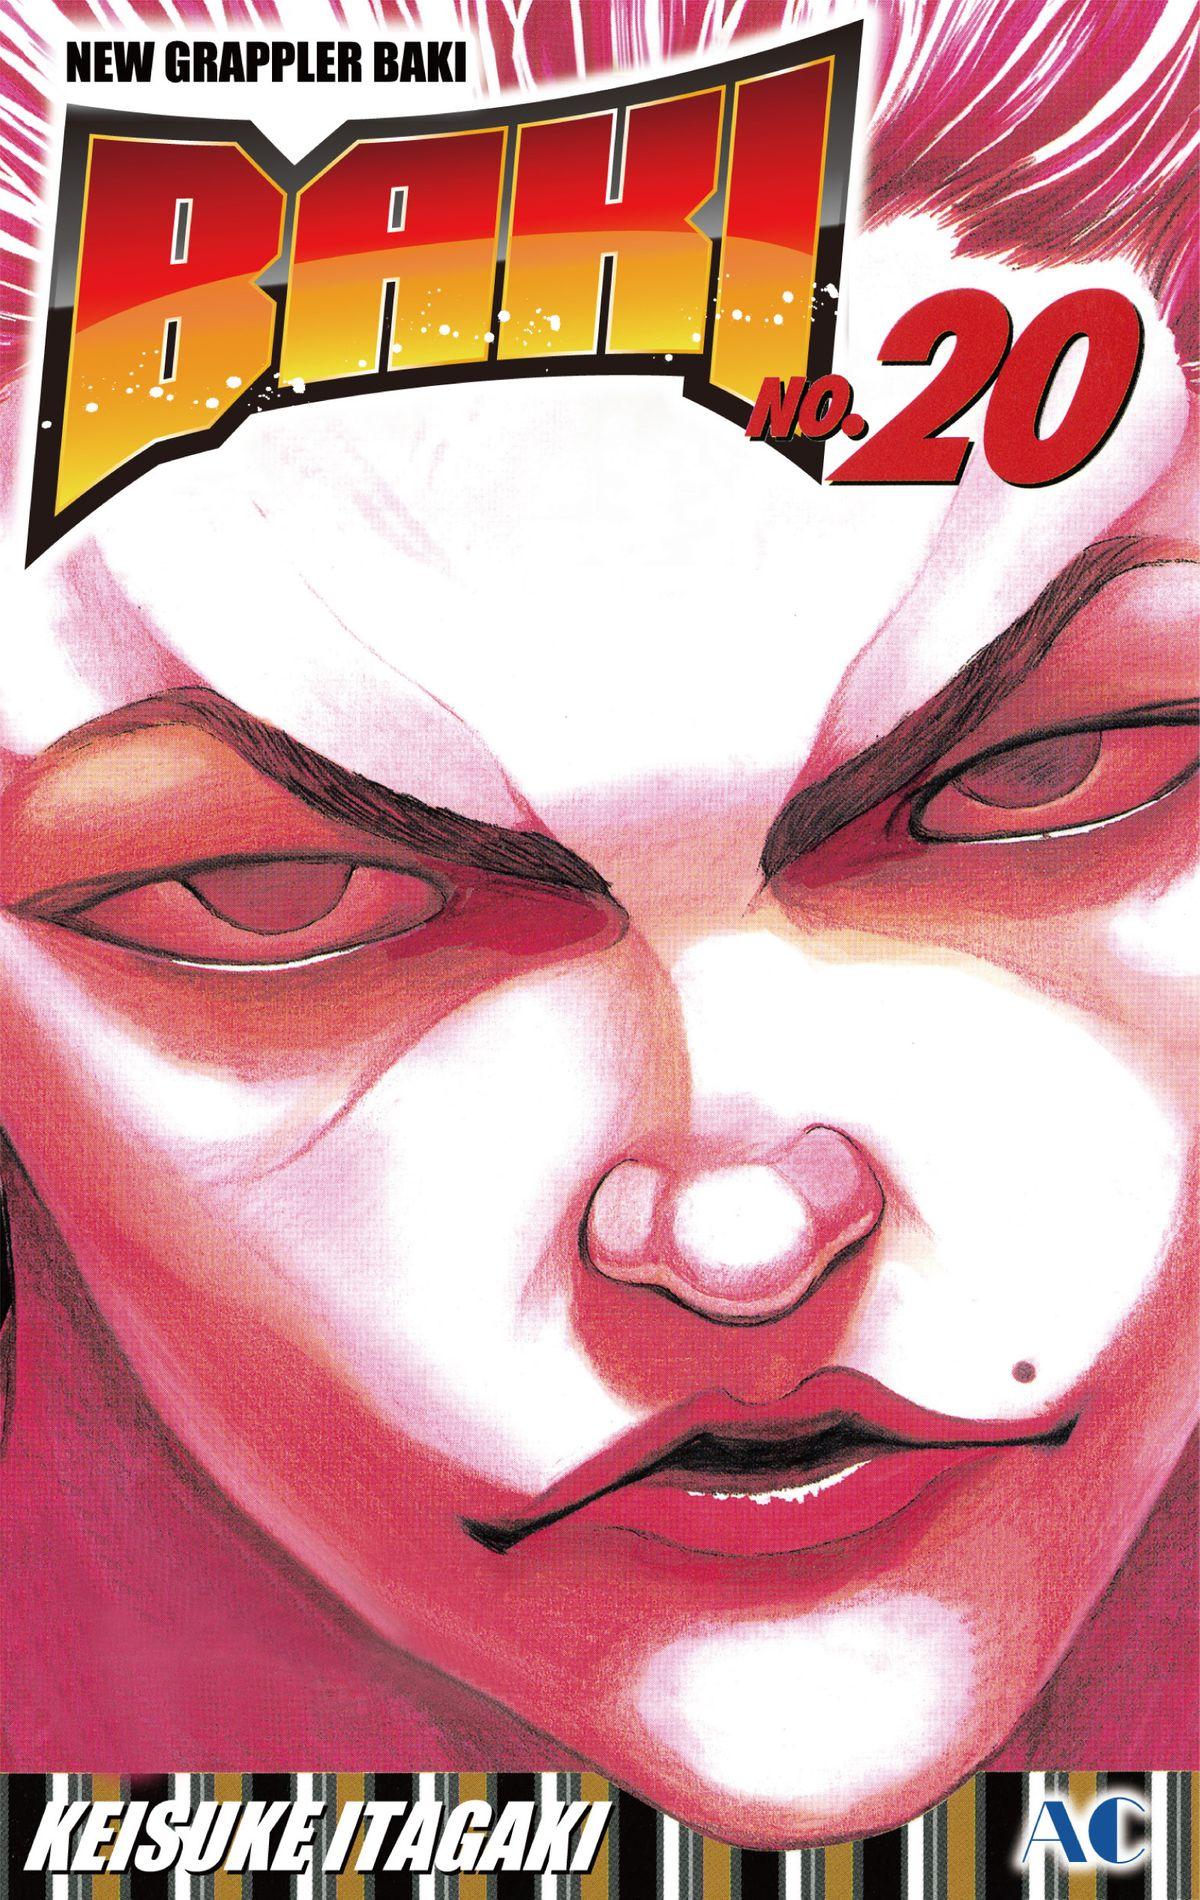 New Grappler Baki Manga Volume 20